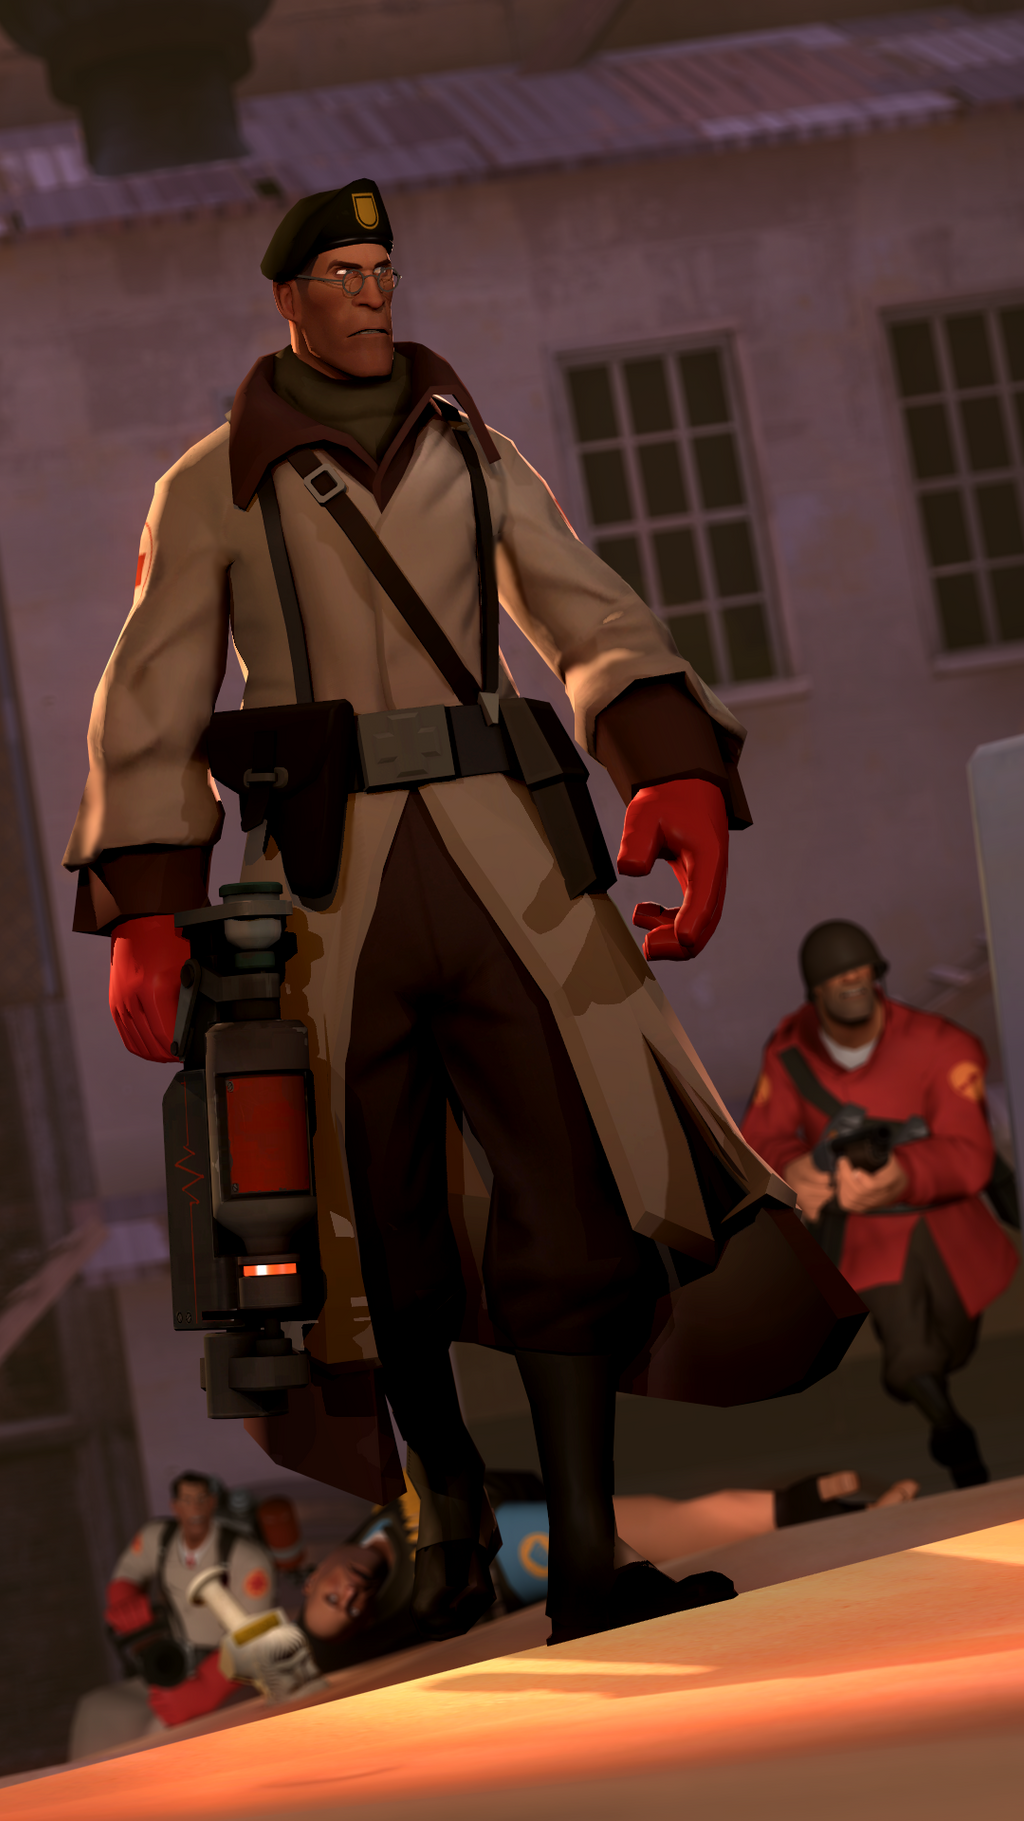 Battle Medic by d0ntst0pme